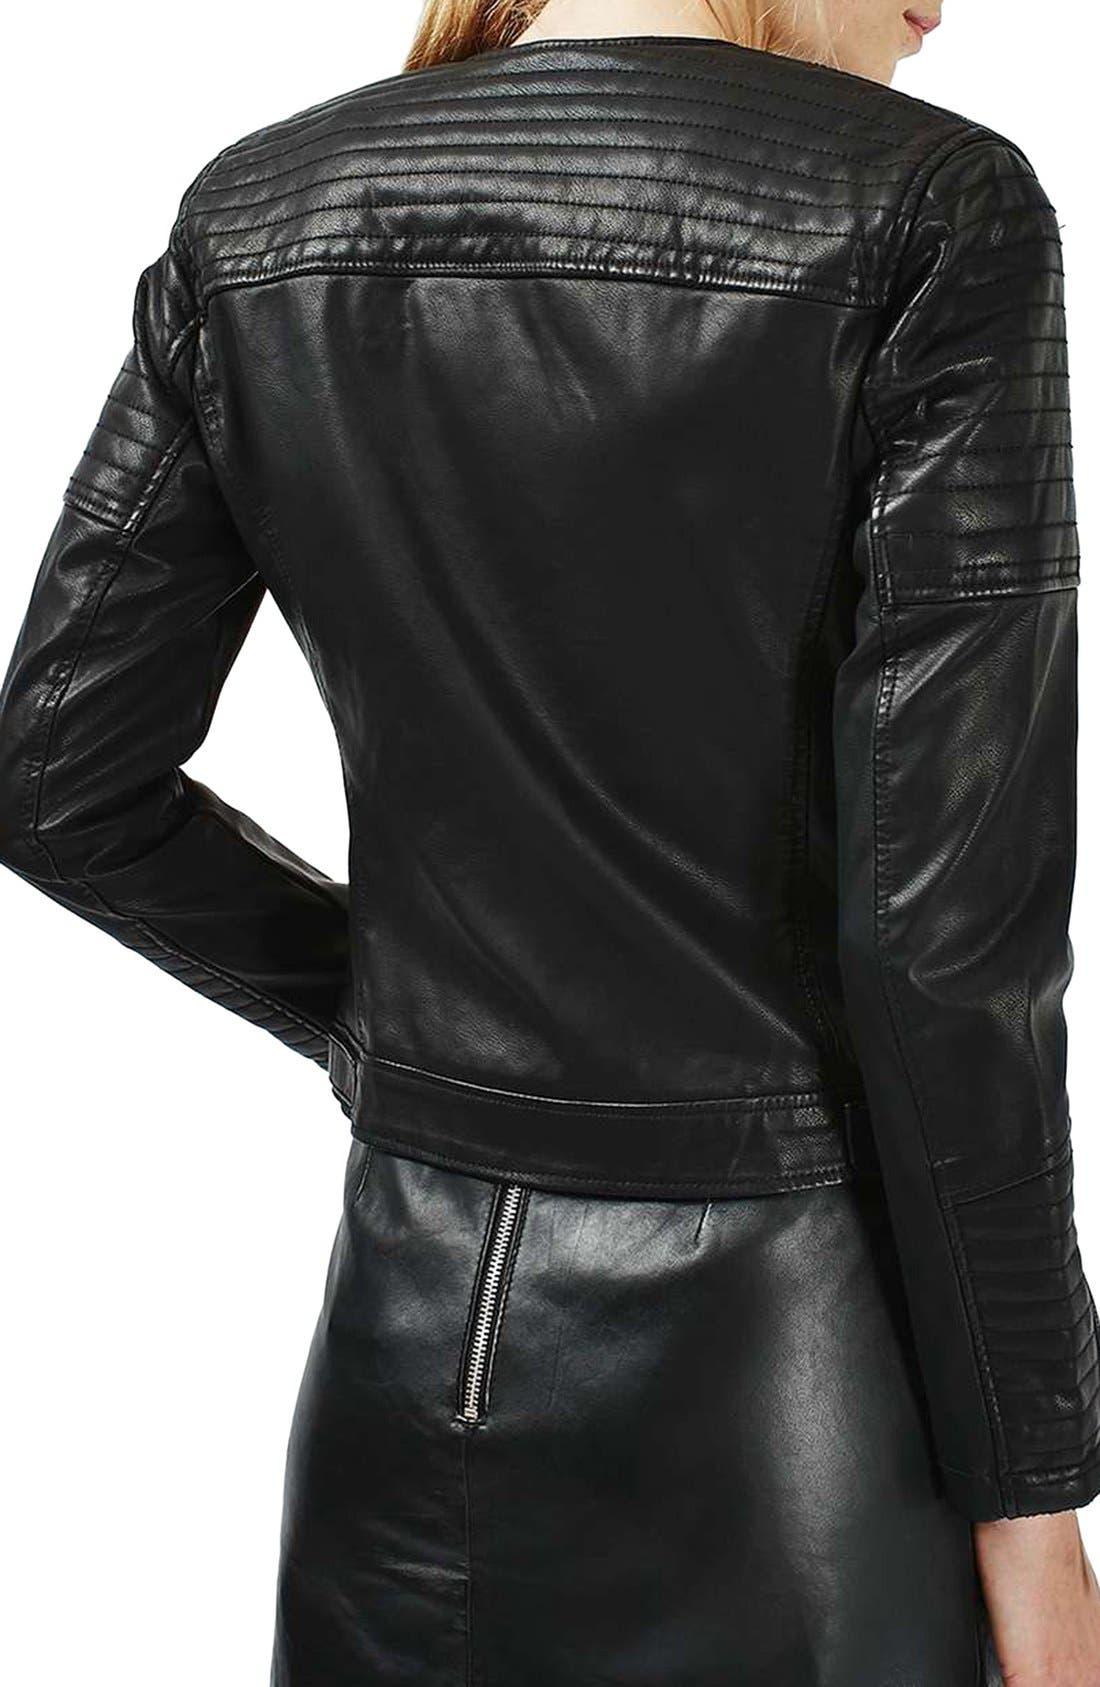 TOPSHOP,                             Nelly Faux Leather Biker Jacket,                             Alternate thumbnail 6, color,                             001